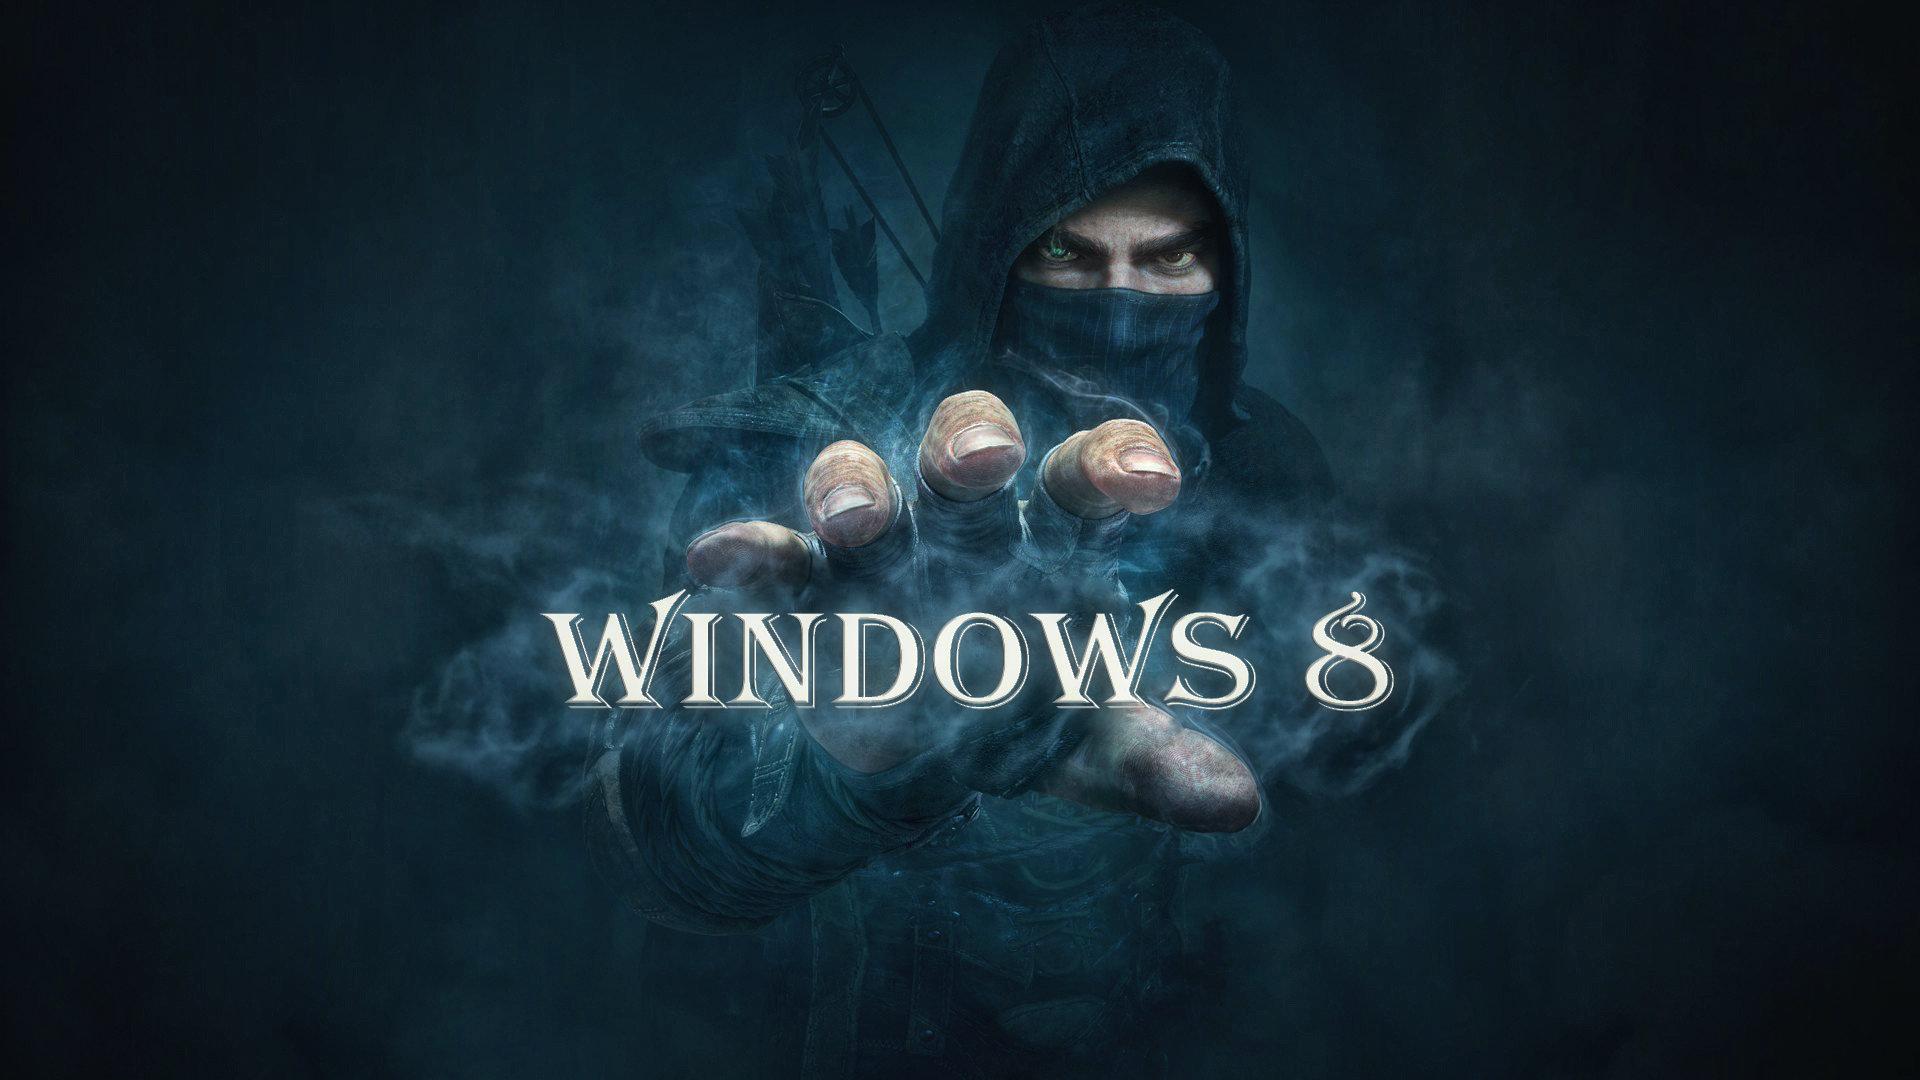 High resolution Windows 8 hd 1080p wallpaper ID78089 for computer 1920x1080